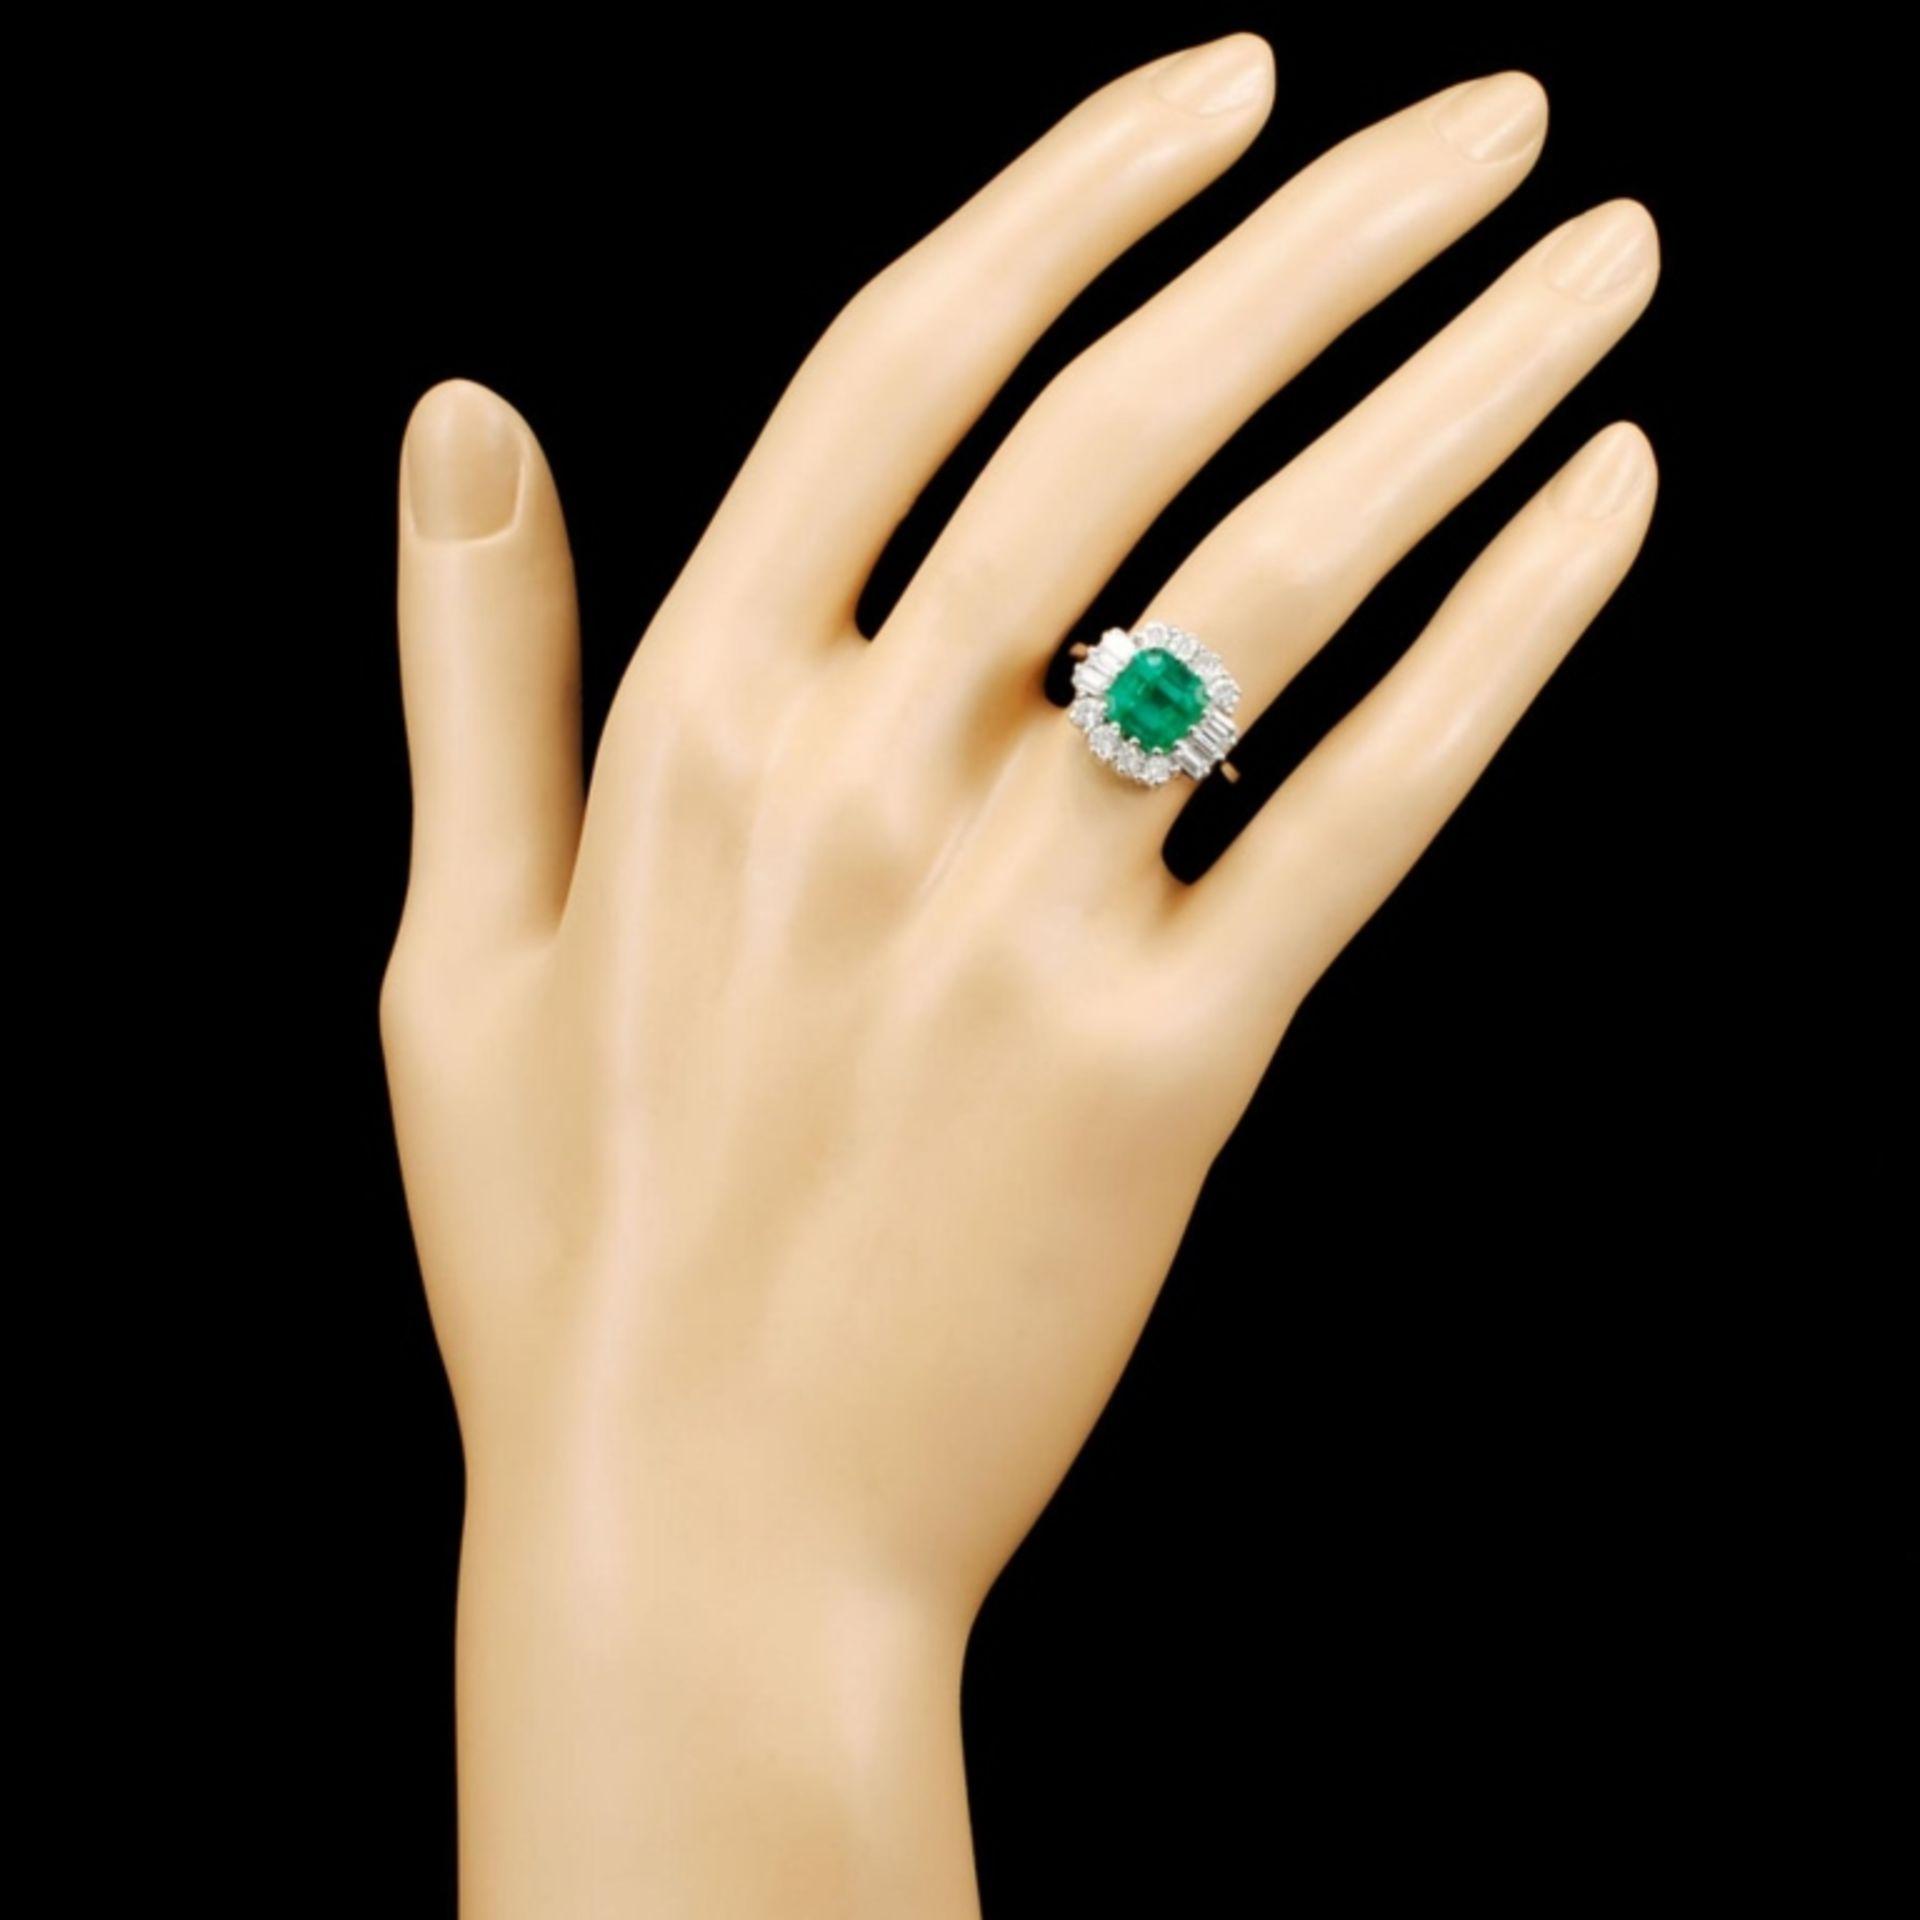 18K Gold 2.80ct Emerald & 1.00ctw Diamond Ring - Image 4 of 5